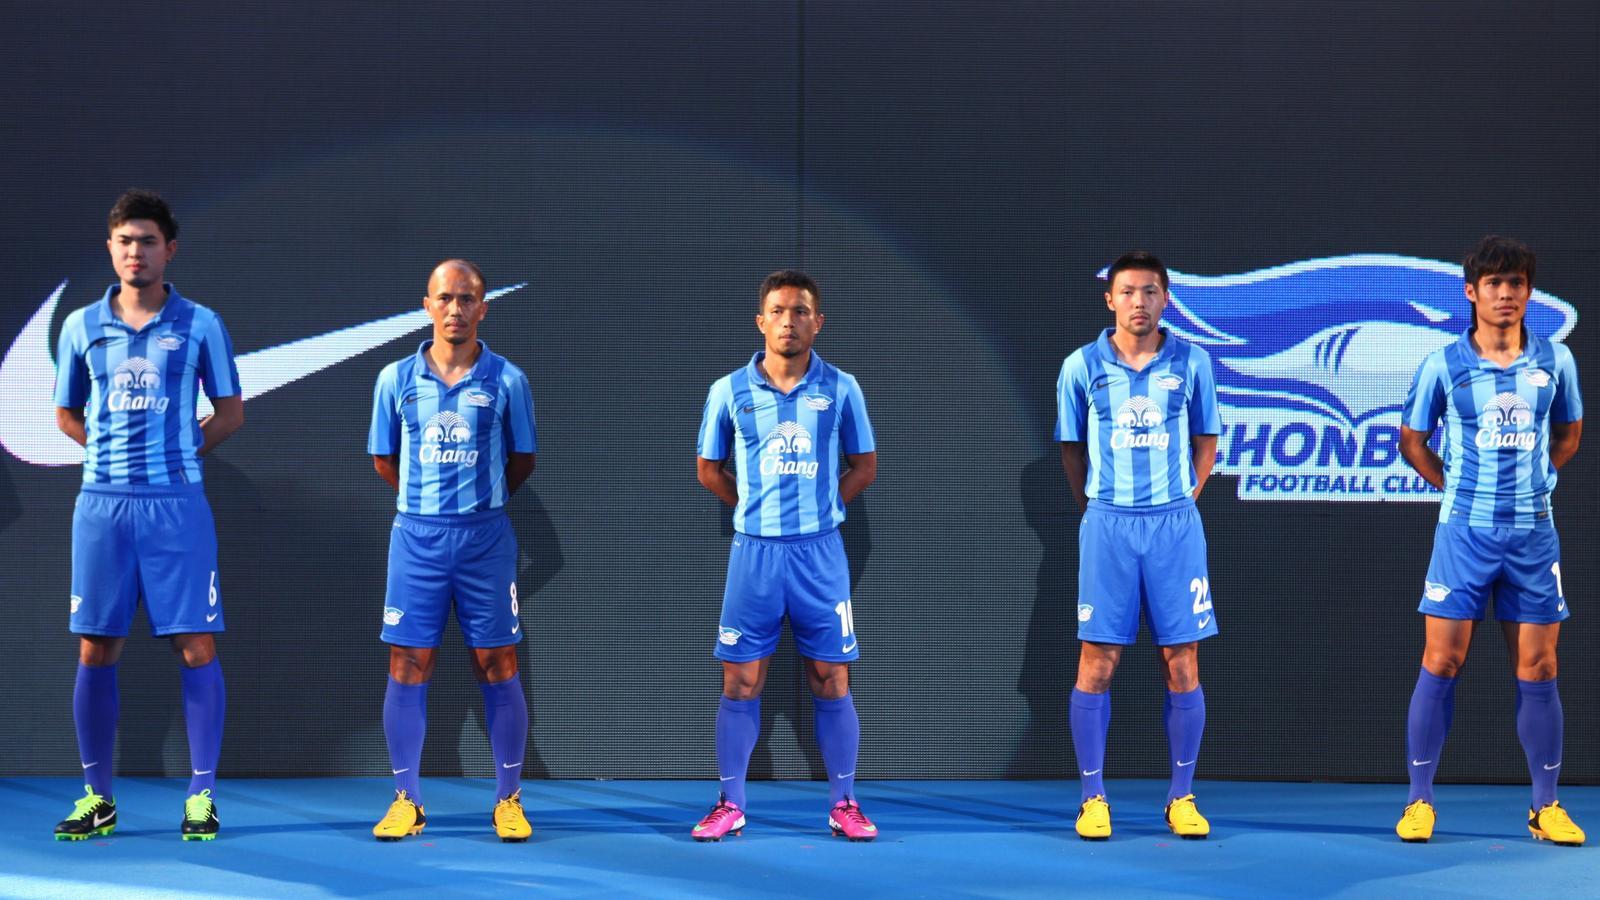 Chonburi FC Club Kit HOME 2013/2014